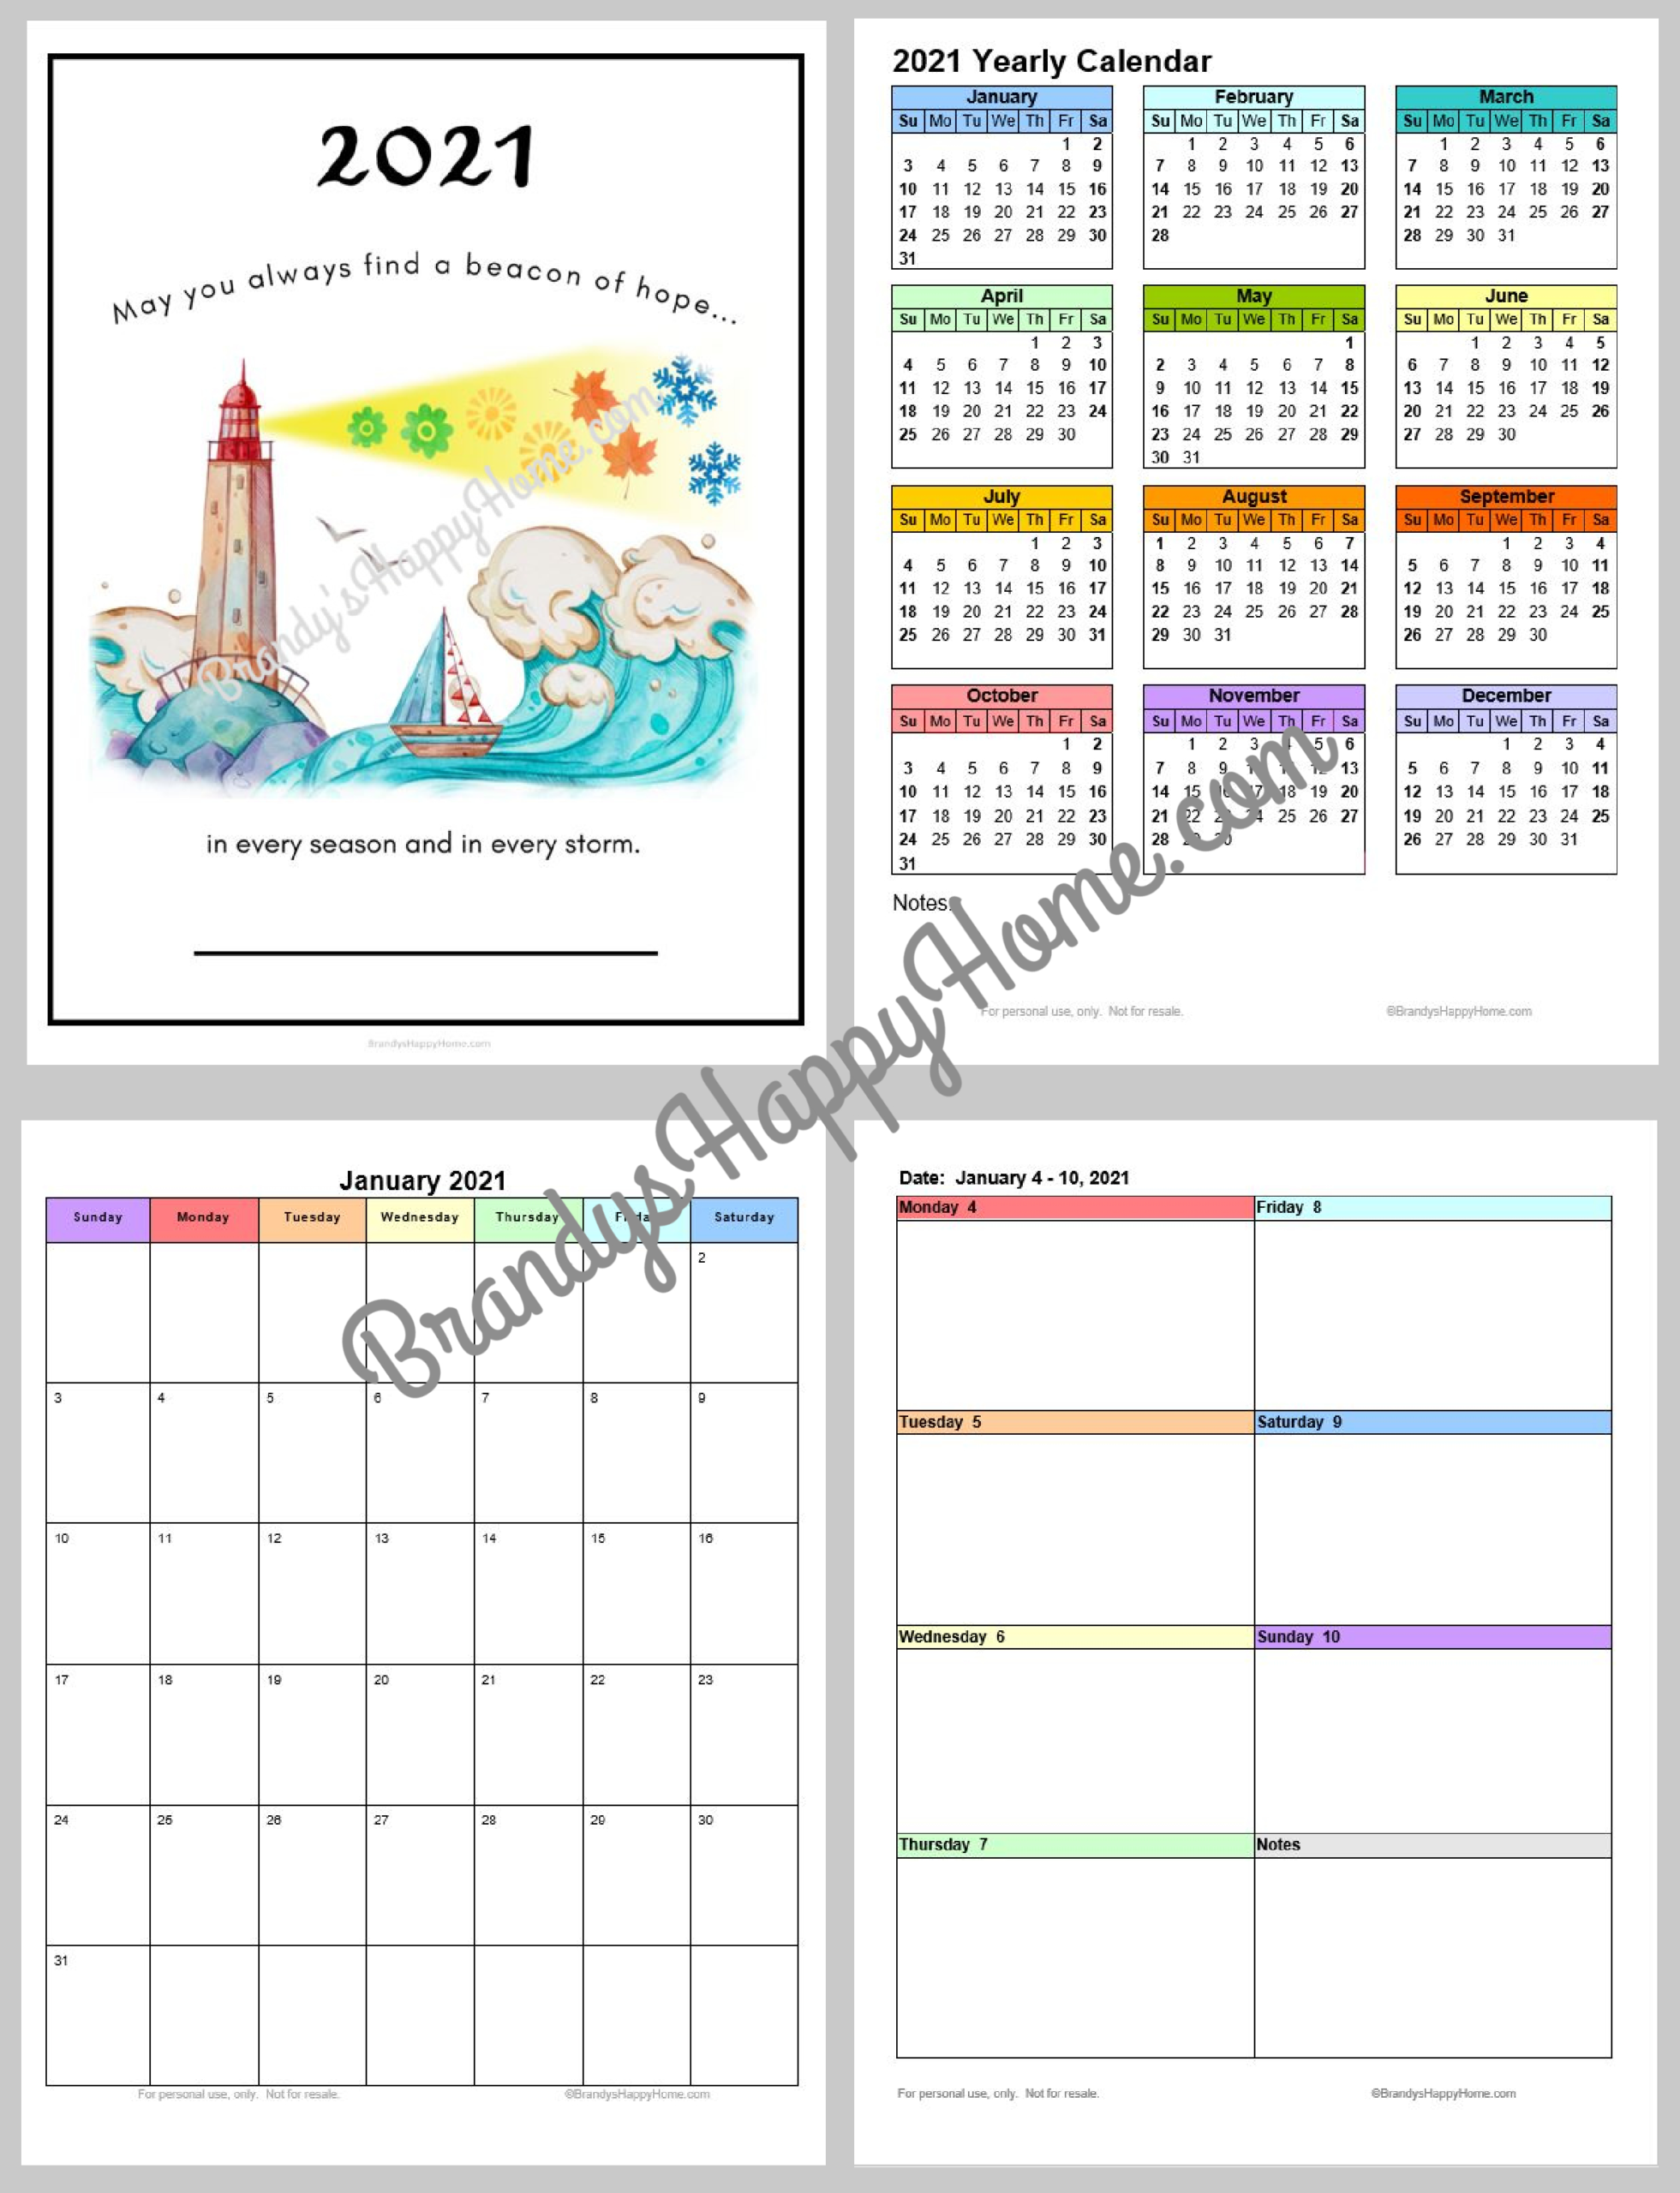 Free 2021 Calendar Planner Printables throughout 2021 Planner: Weekly Calendar Planner